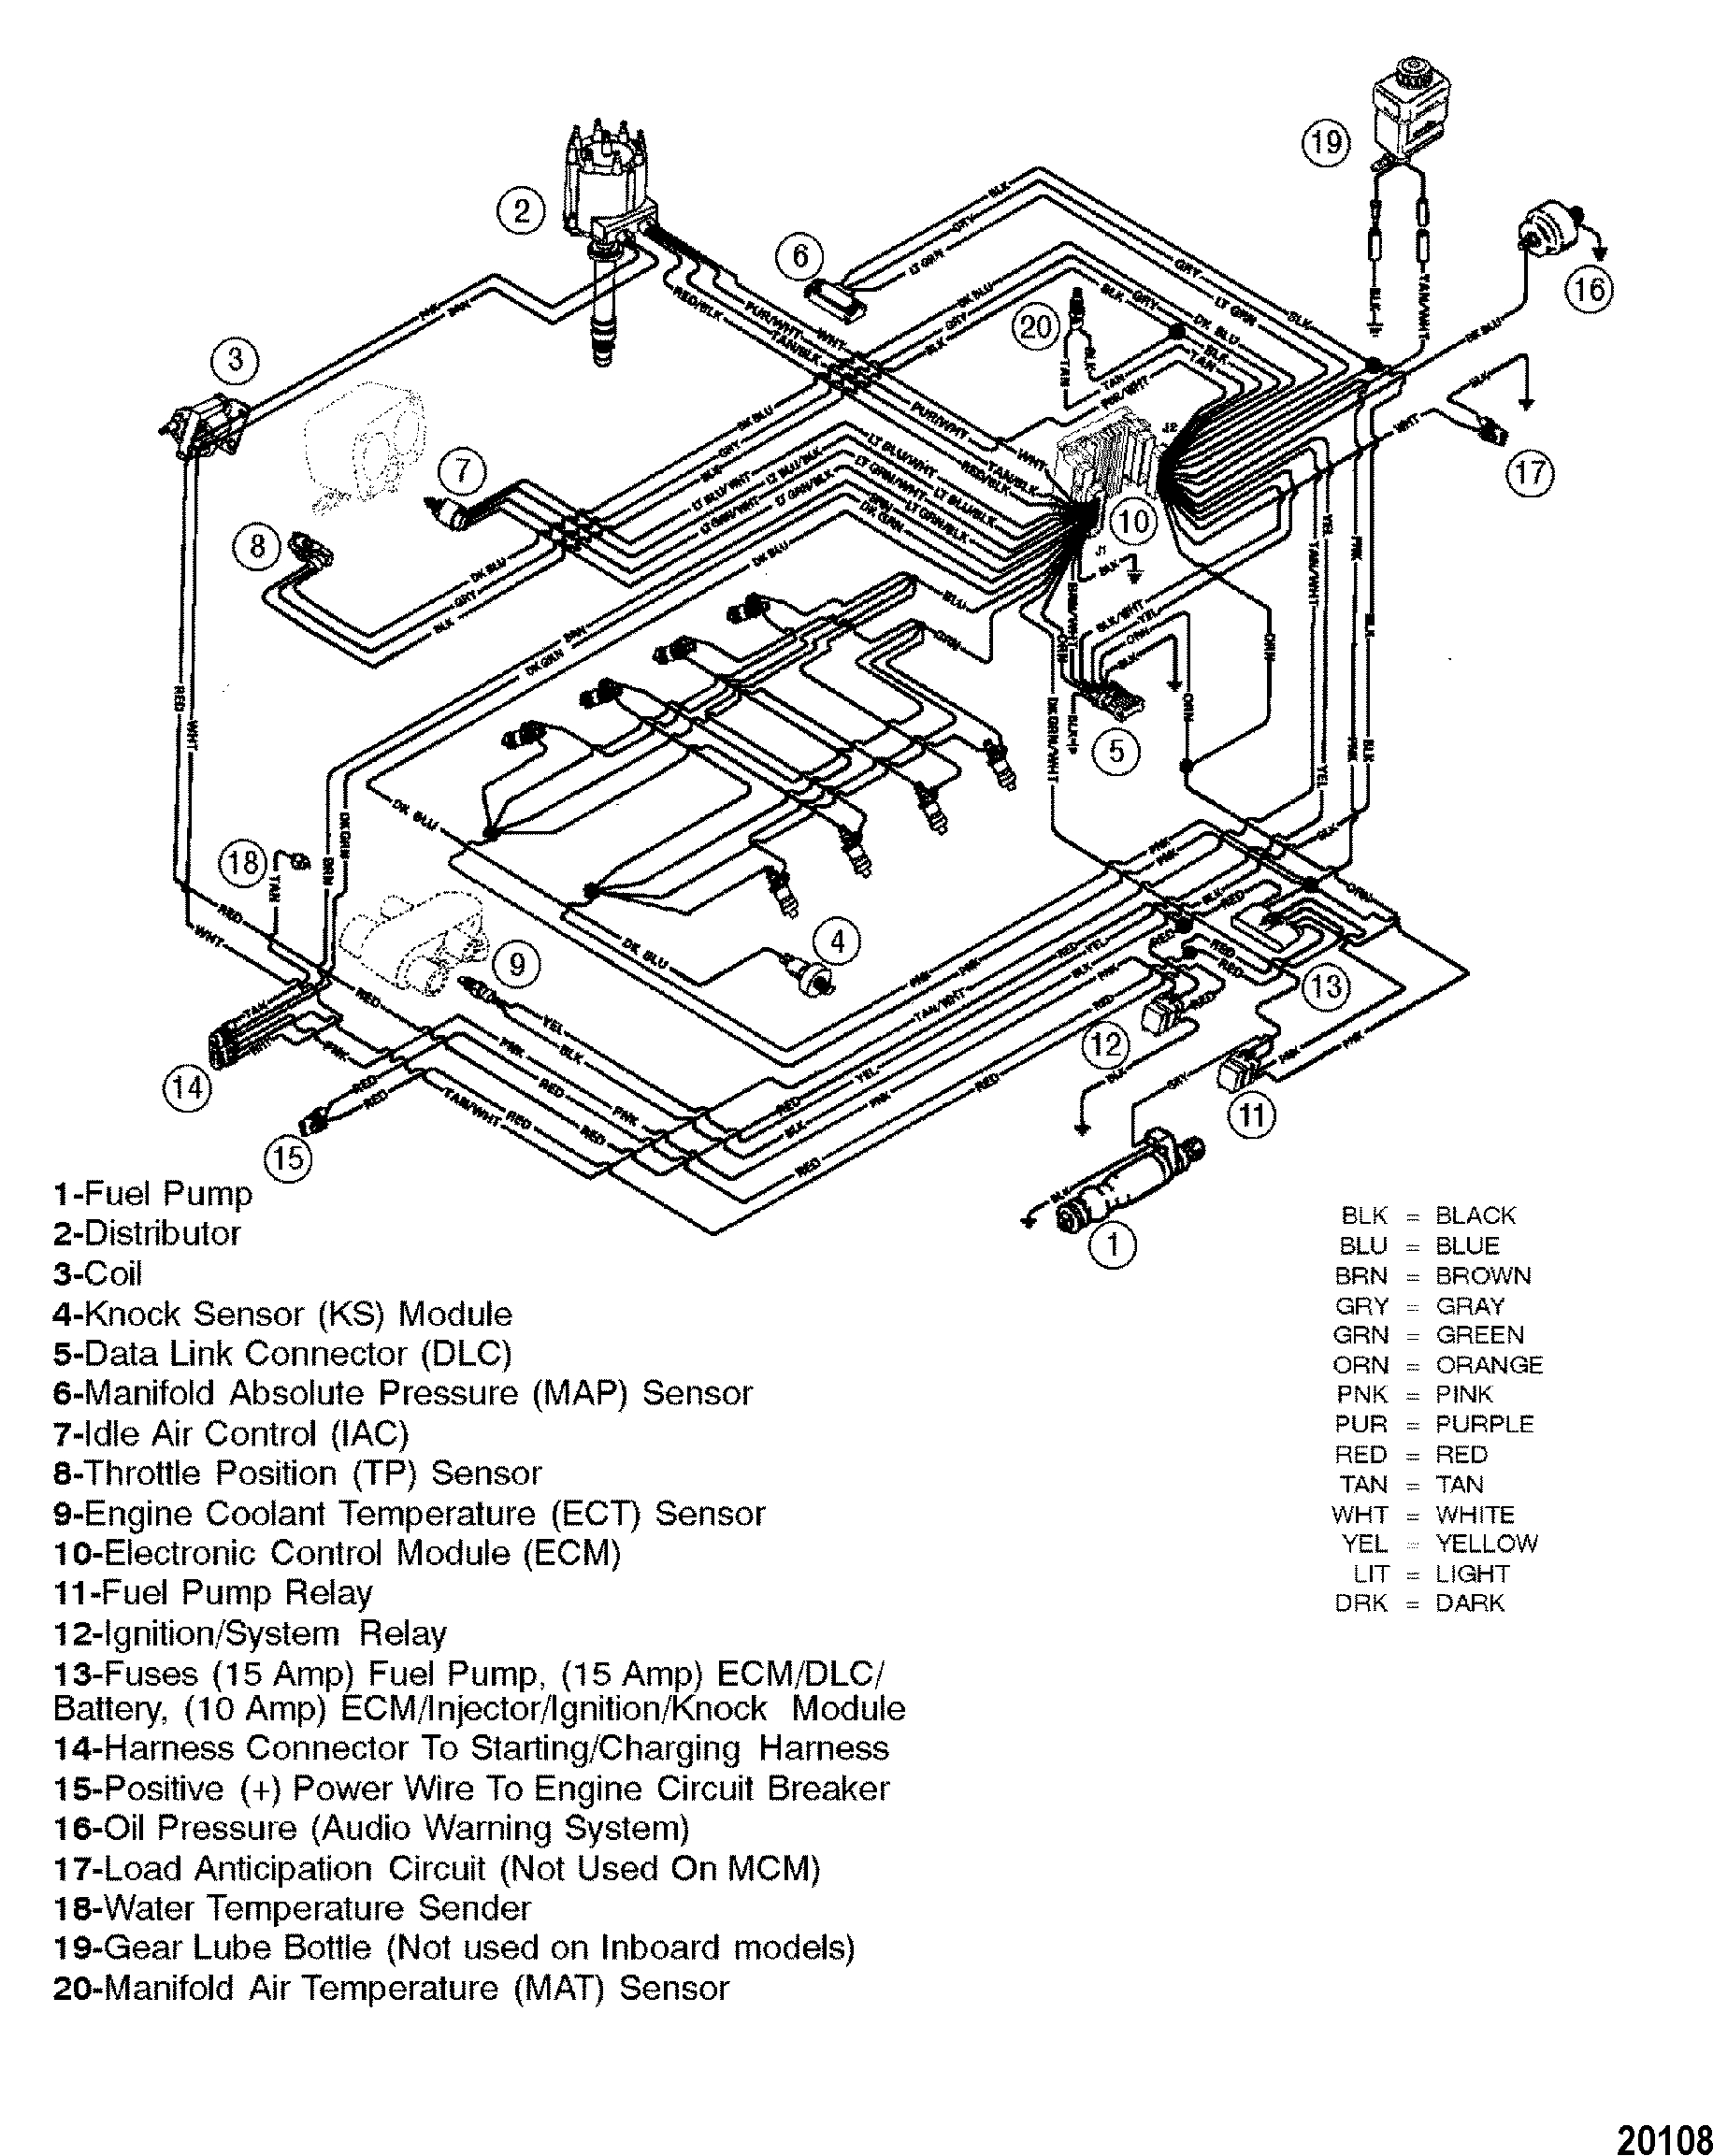 Cp Performance - Wiring Harness (Efi) - Mercruiser Wiring Diagram